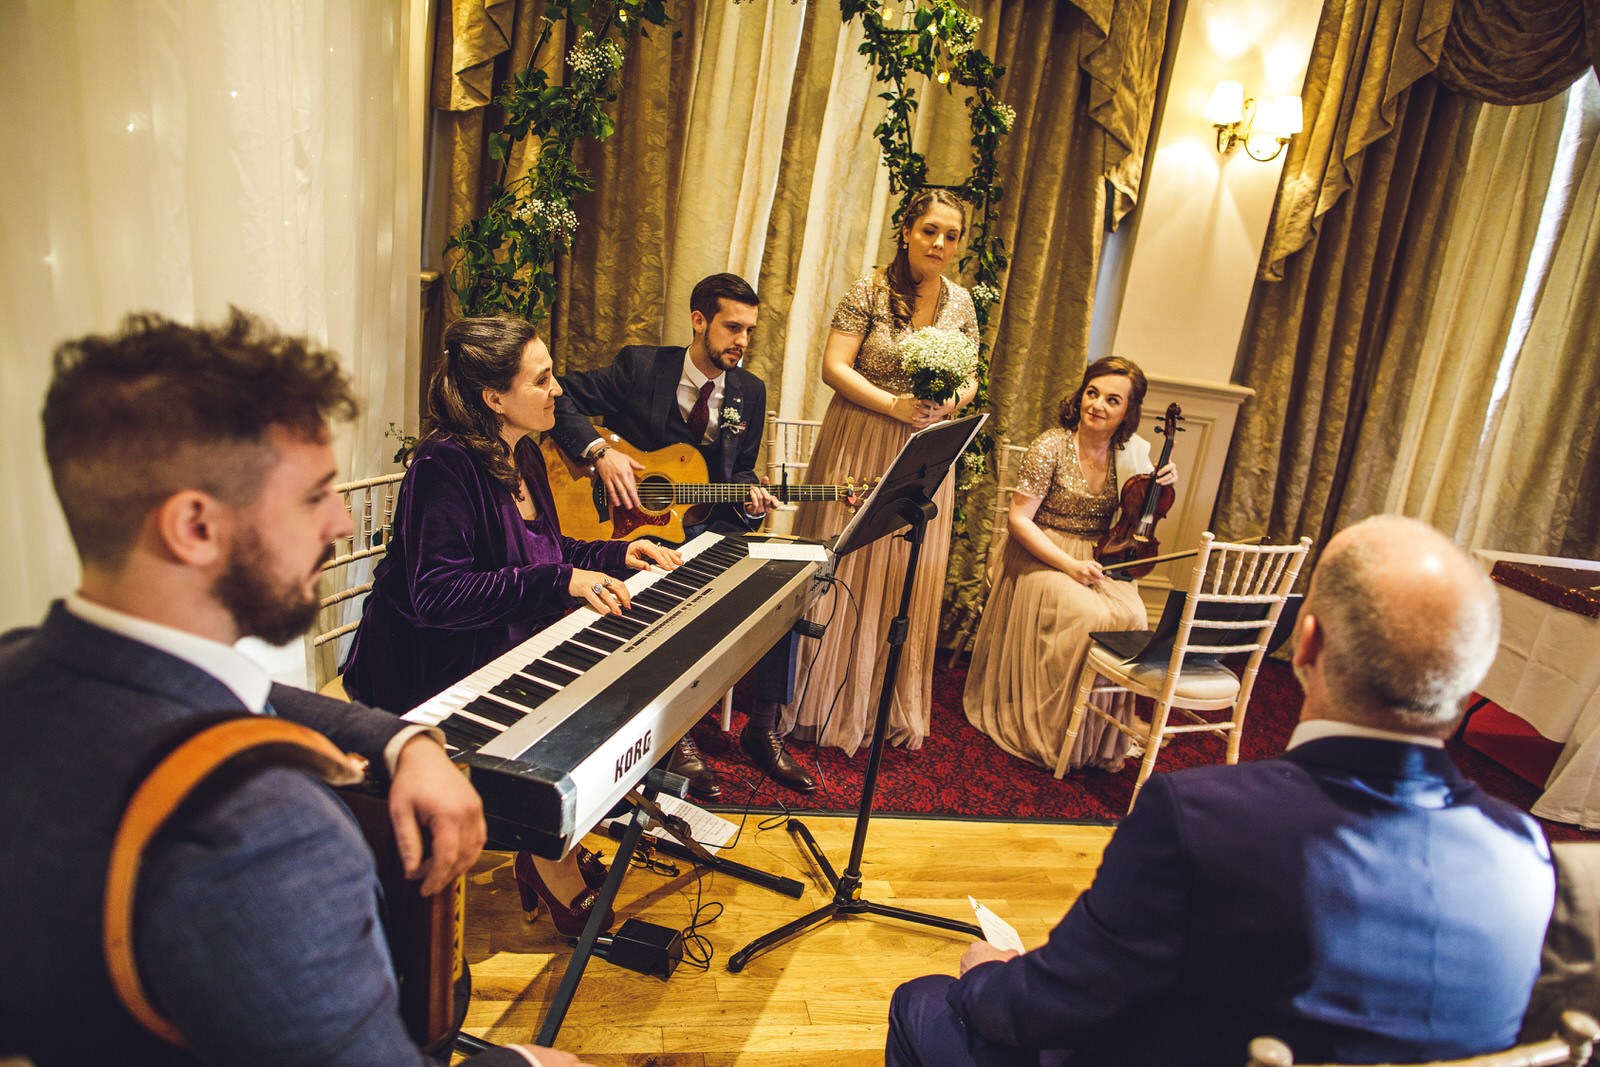 Roger-kenny-wedding-photographer-greystones-wicklow-dublin_041.jpg